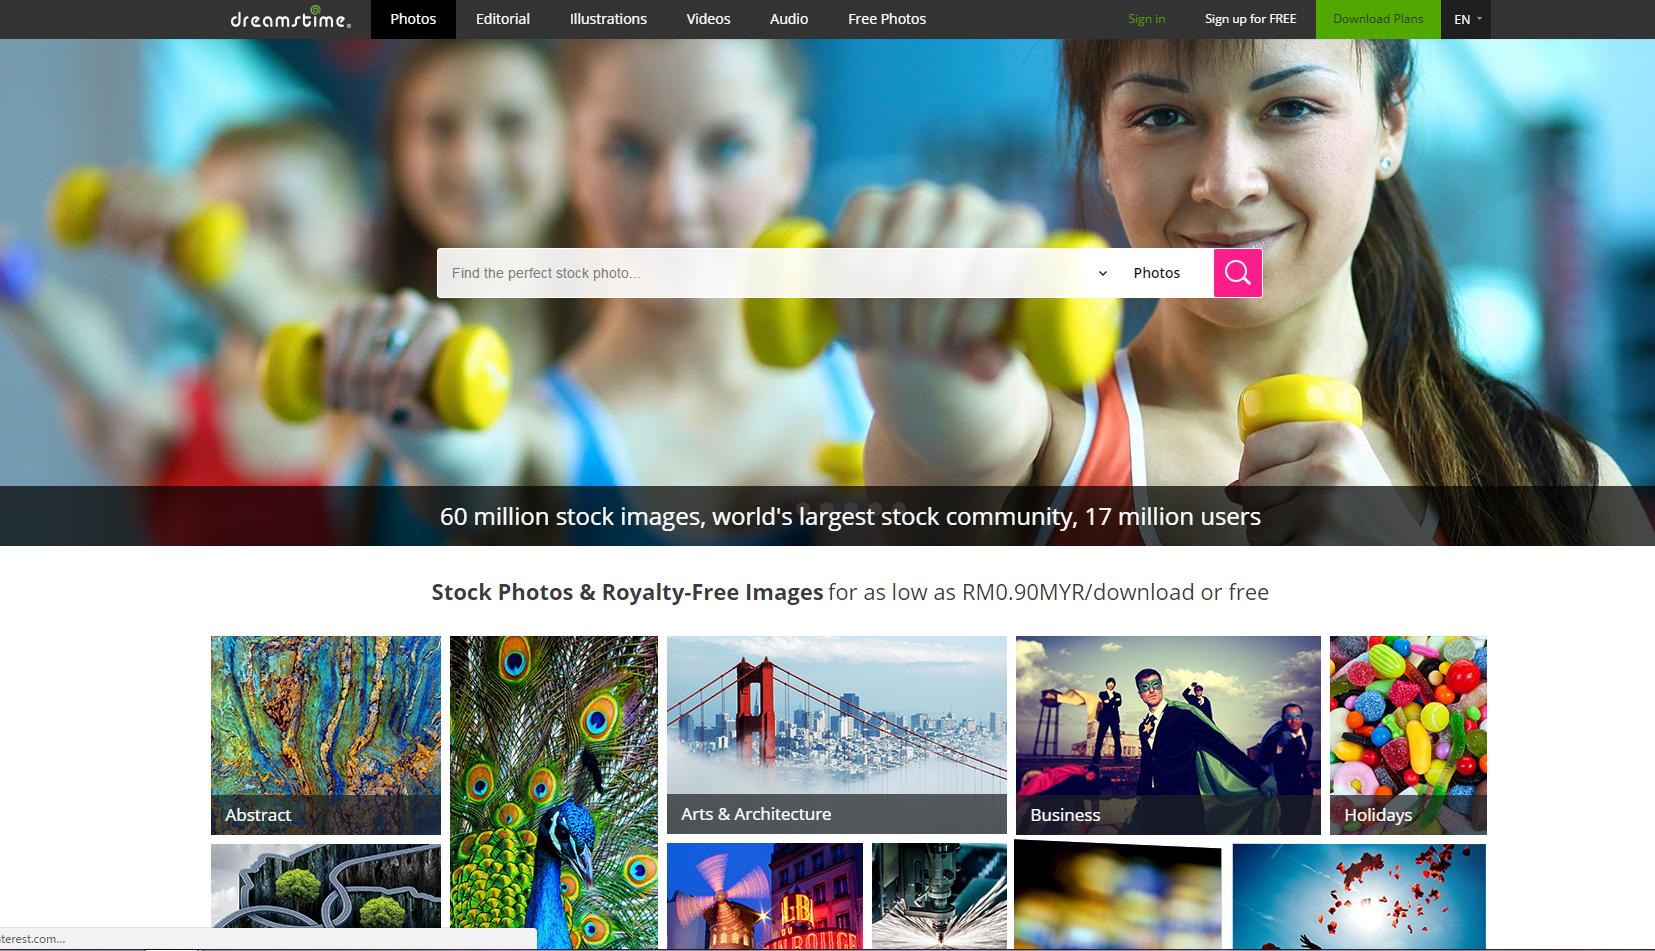 make money selling photos - dreamstime